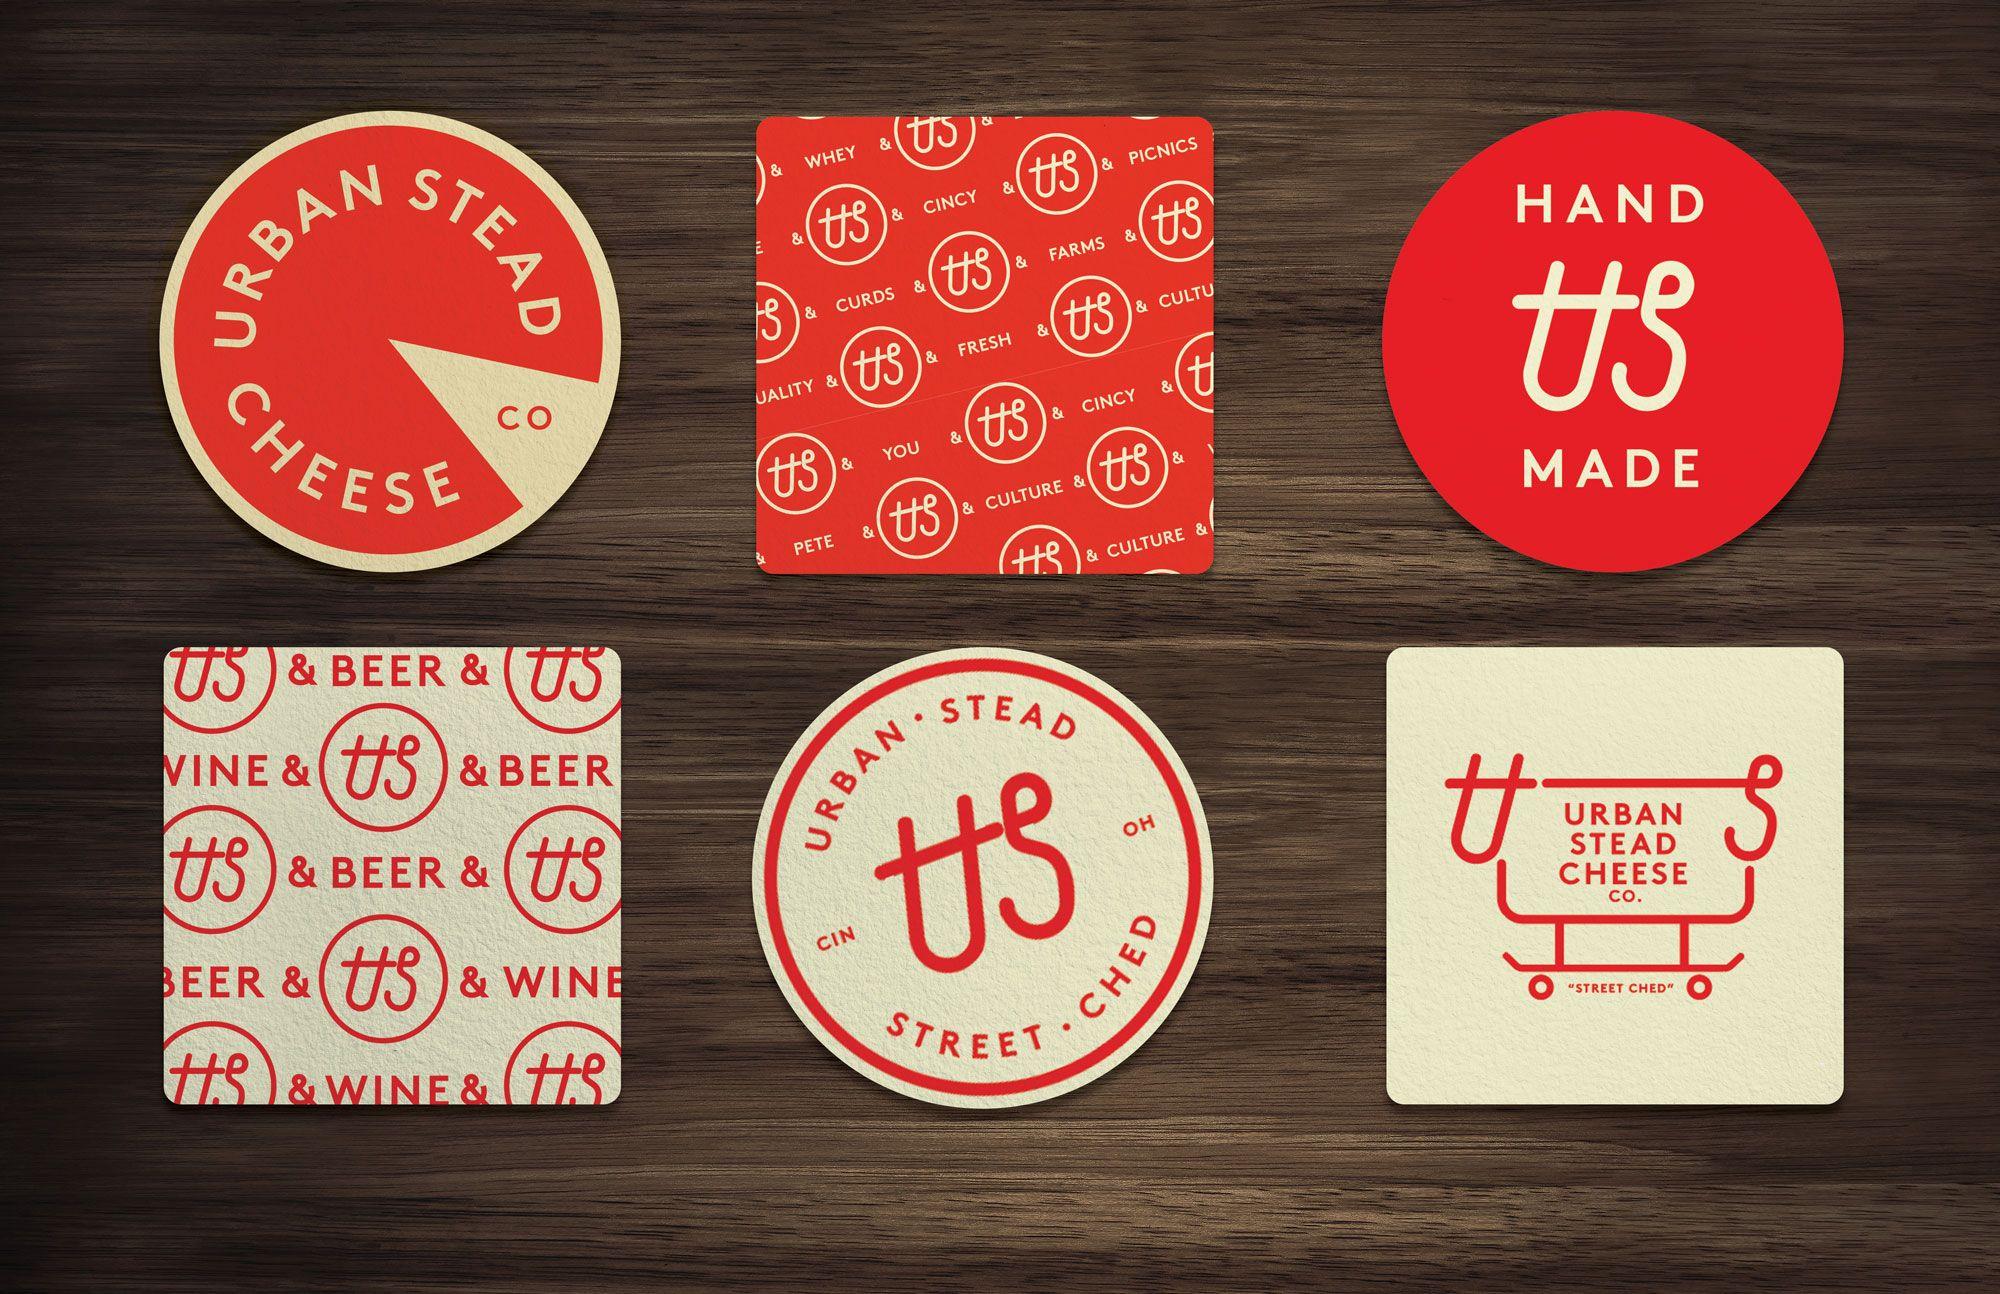 Urban Stead Cheese Co Design Project Bldg Refuge Branding Design Logo Branding Design Design Projects